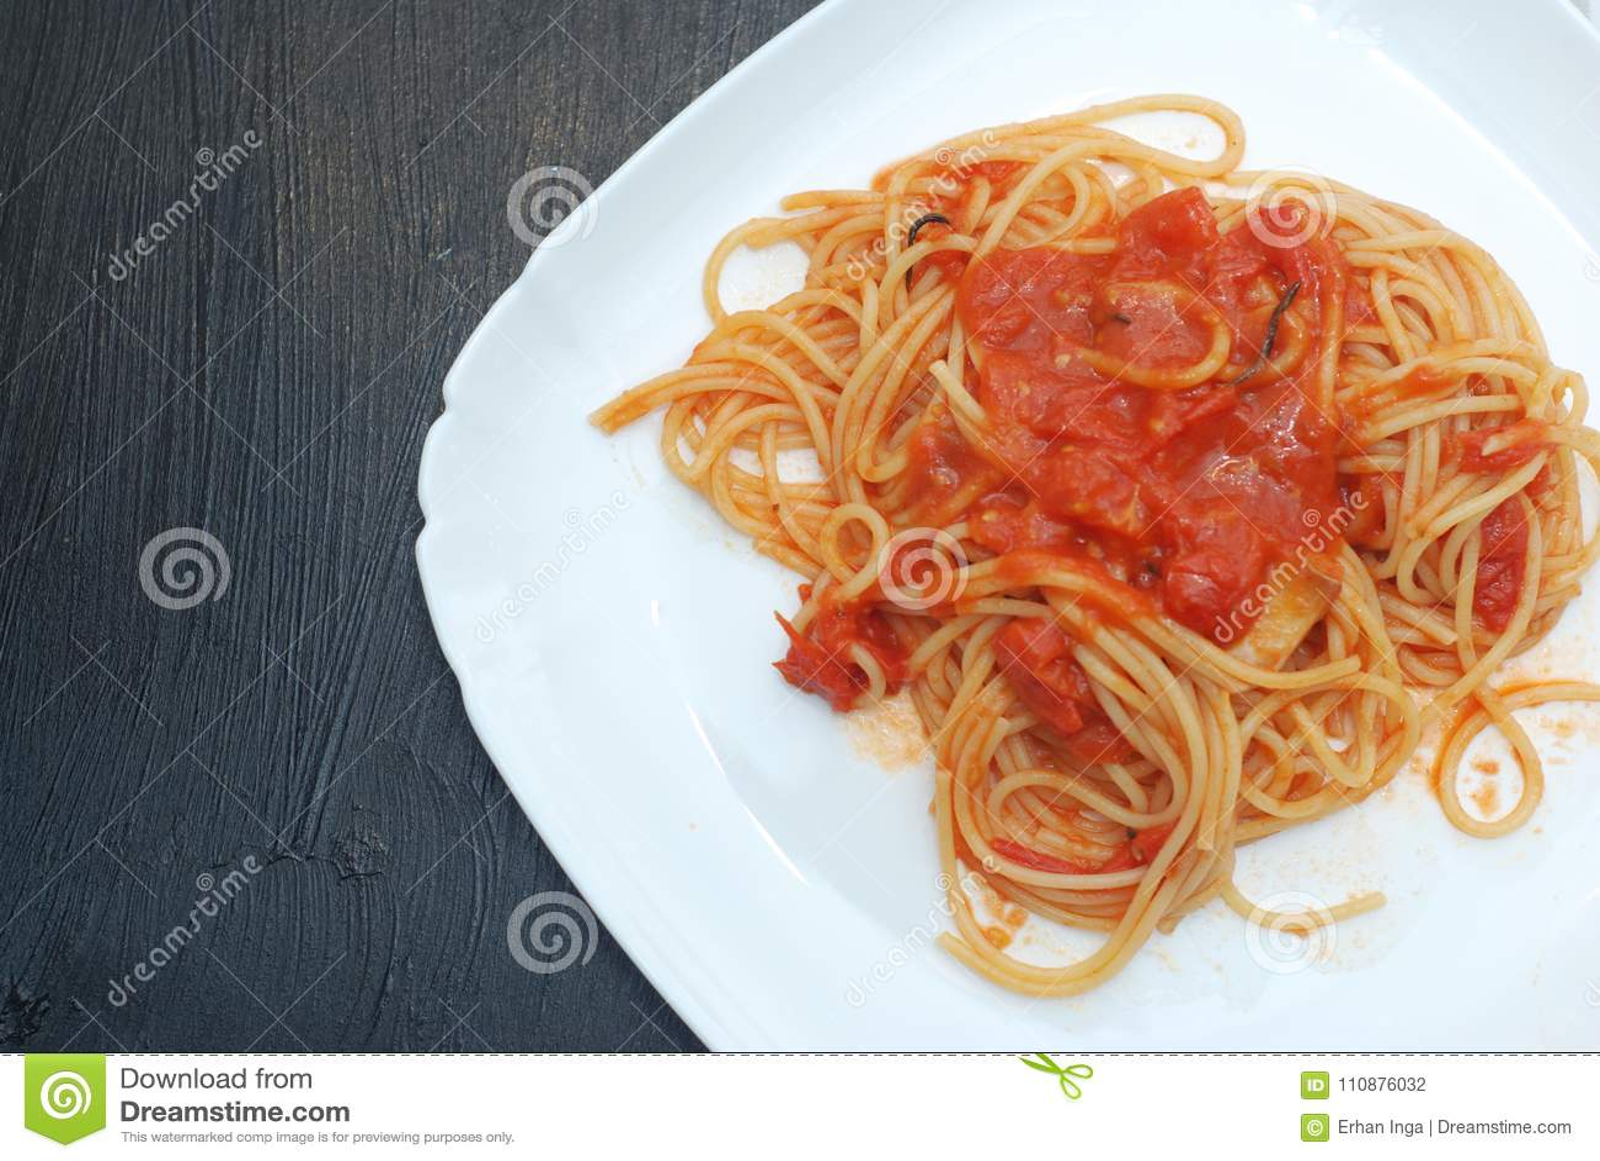 AItalian Spagetthi Bolognese med tomater kryddad sås i den vita plattan